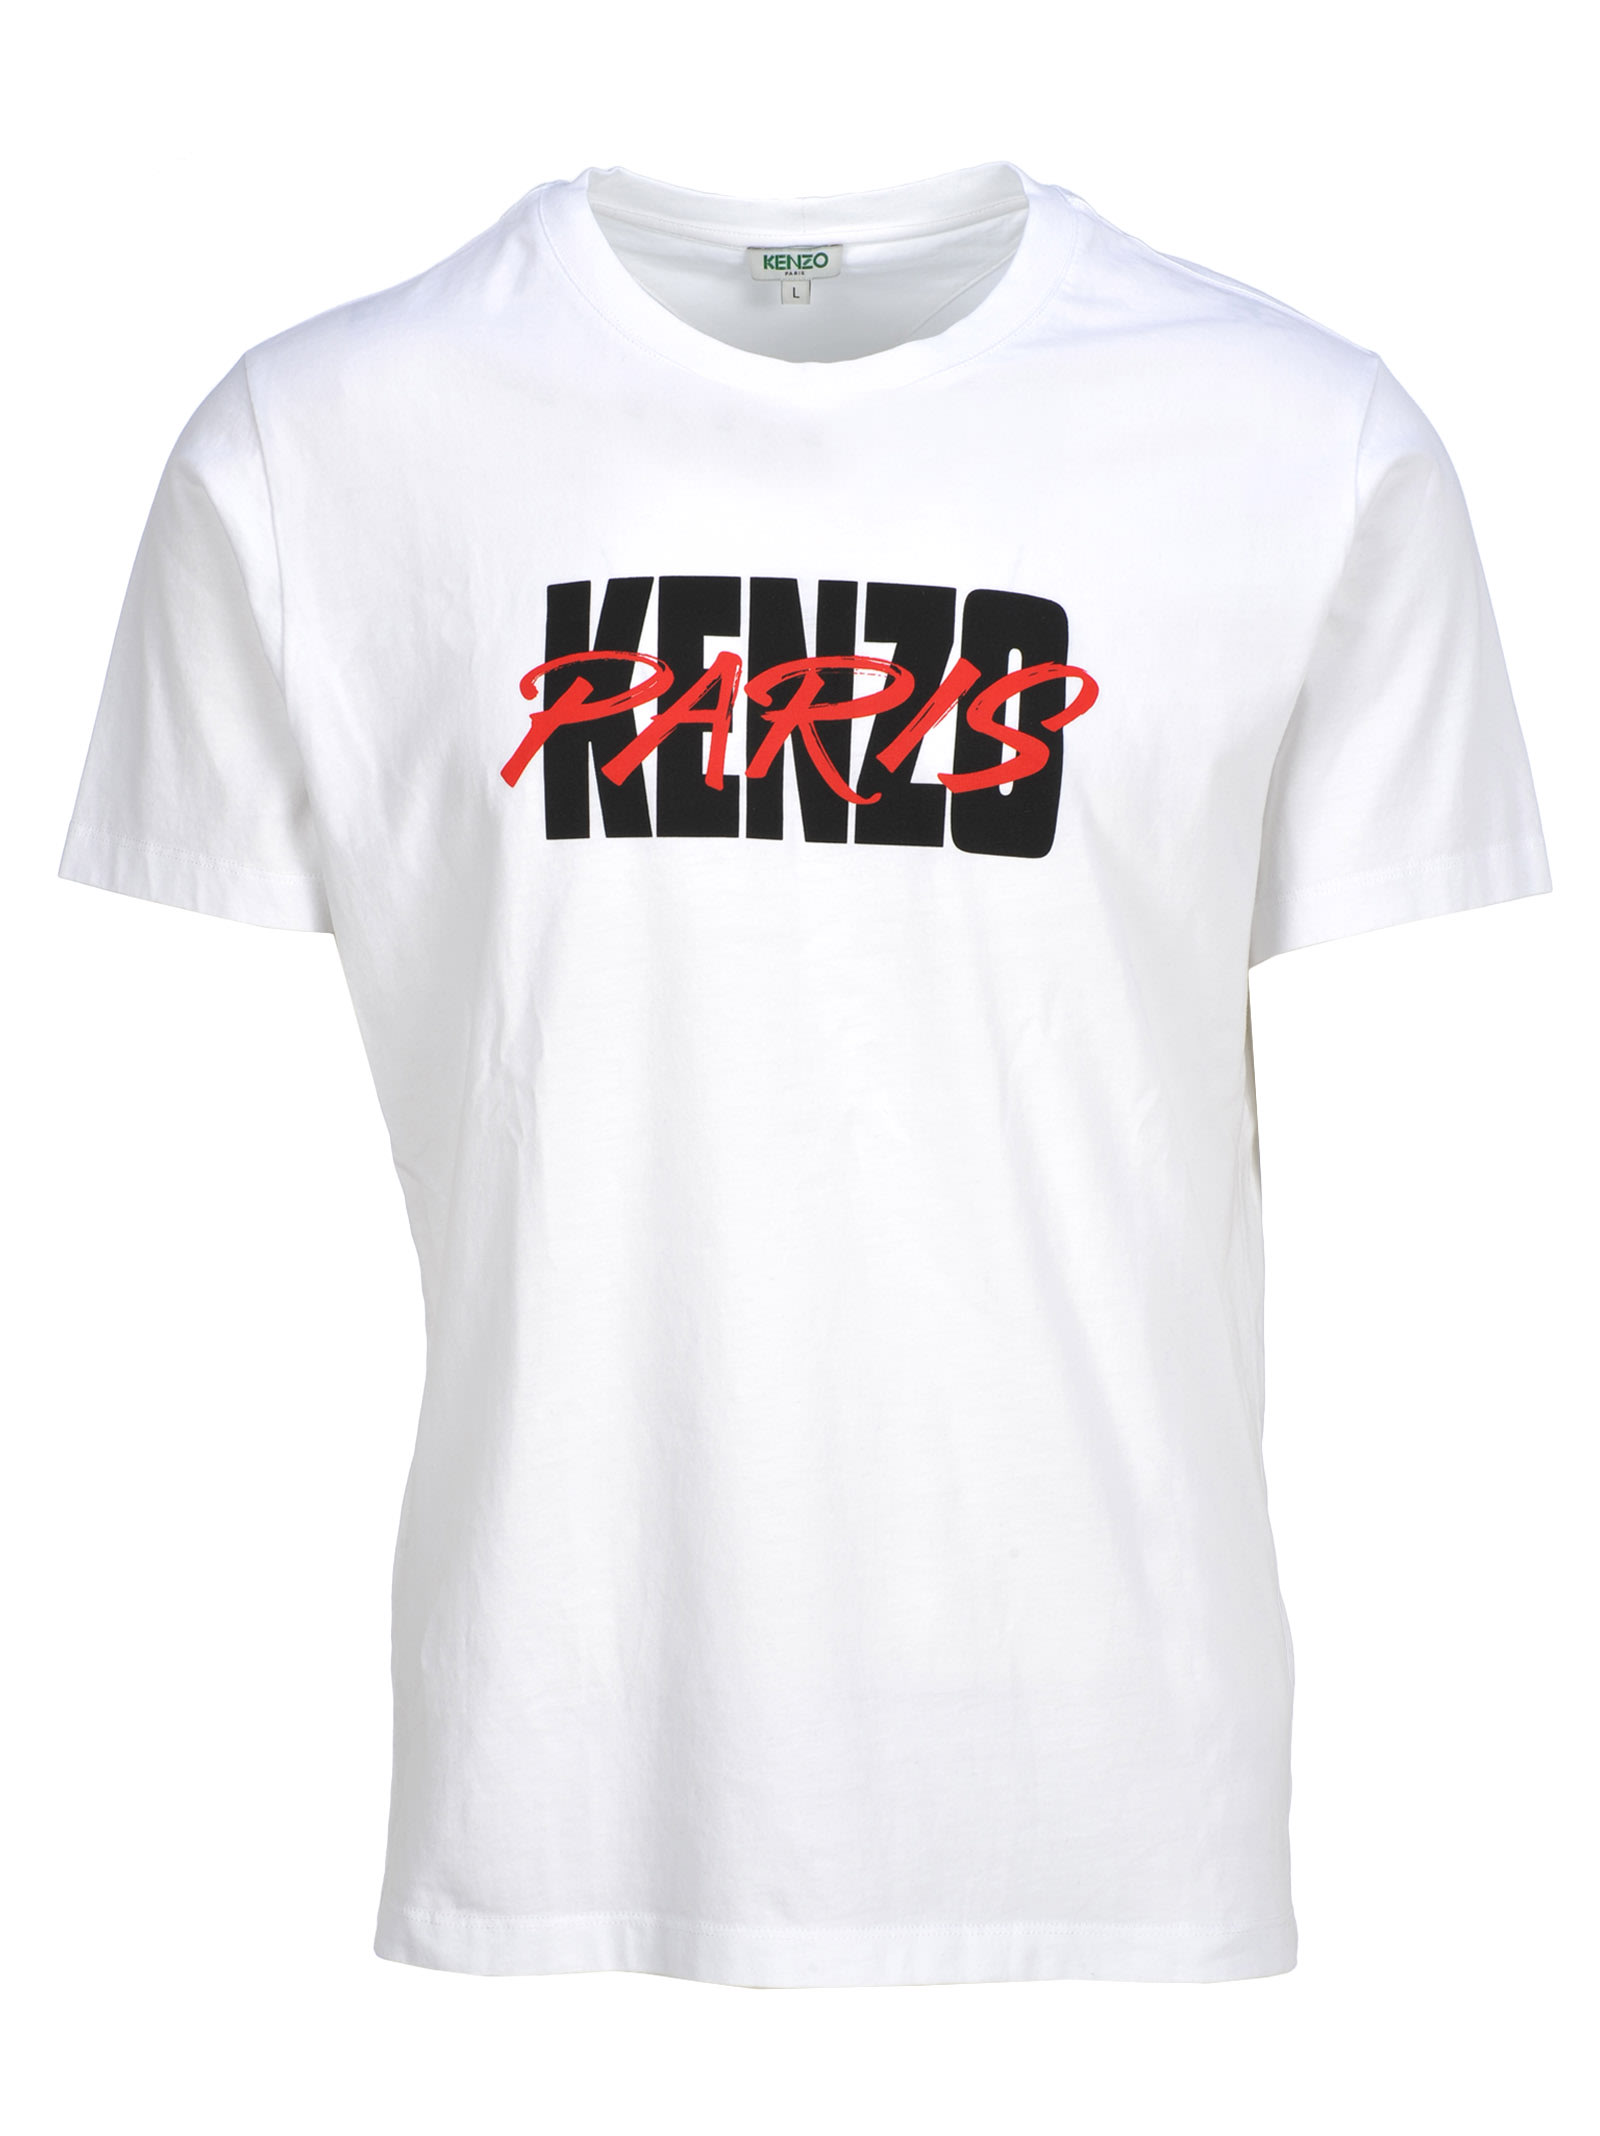 7e093817 Kenzo Kenzo Paris Kenzo Printed T-shirt